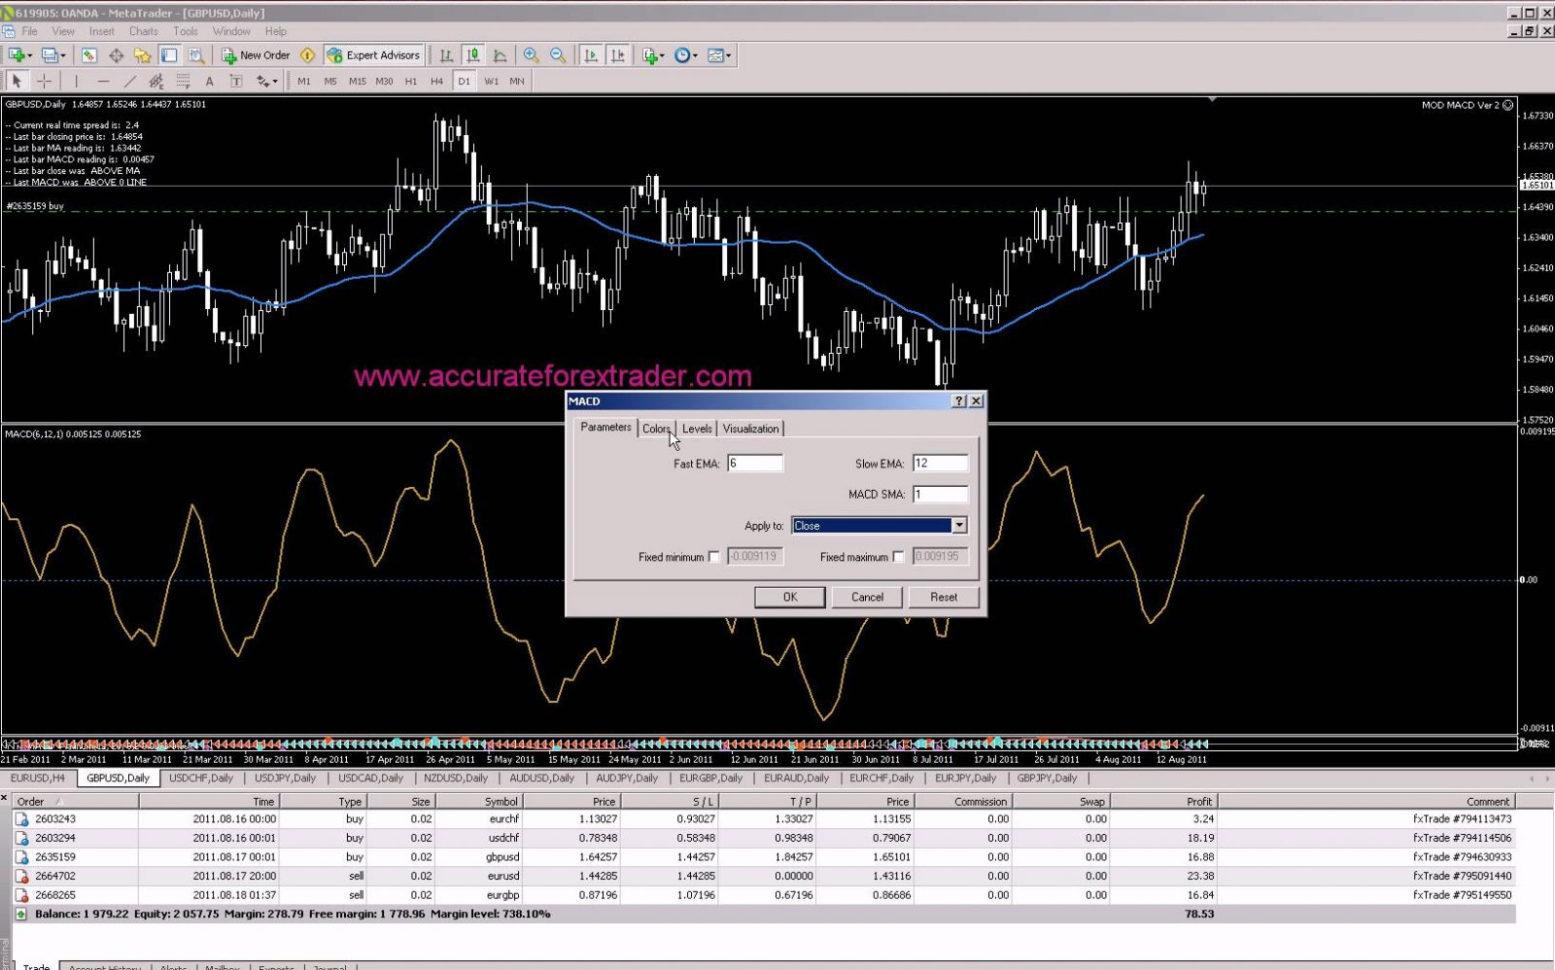 Forex Compounding Spreadsheet Spreadsheet Downloa Forex Compounding Excel Spreadsheet Forex